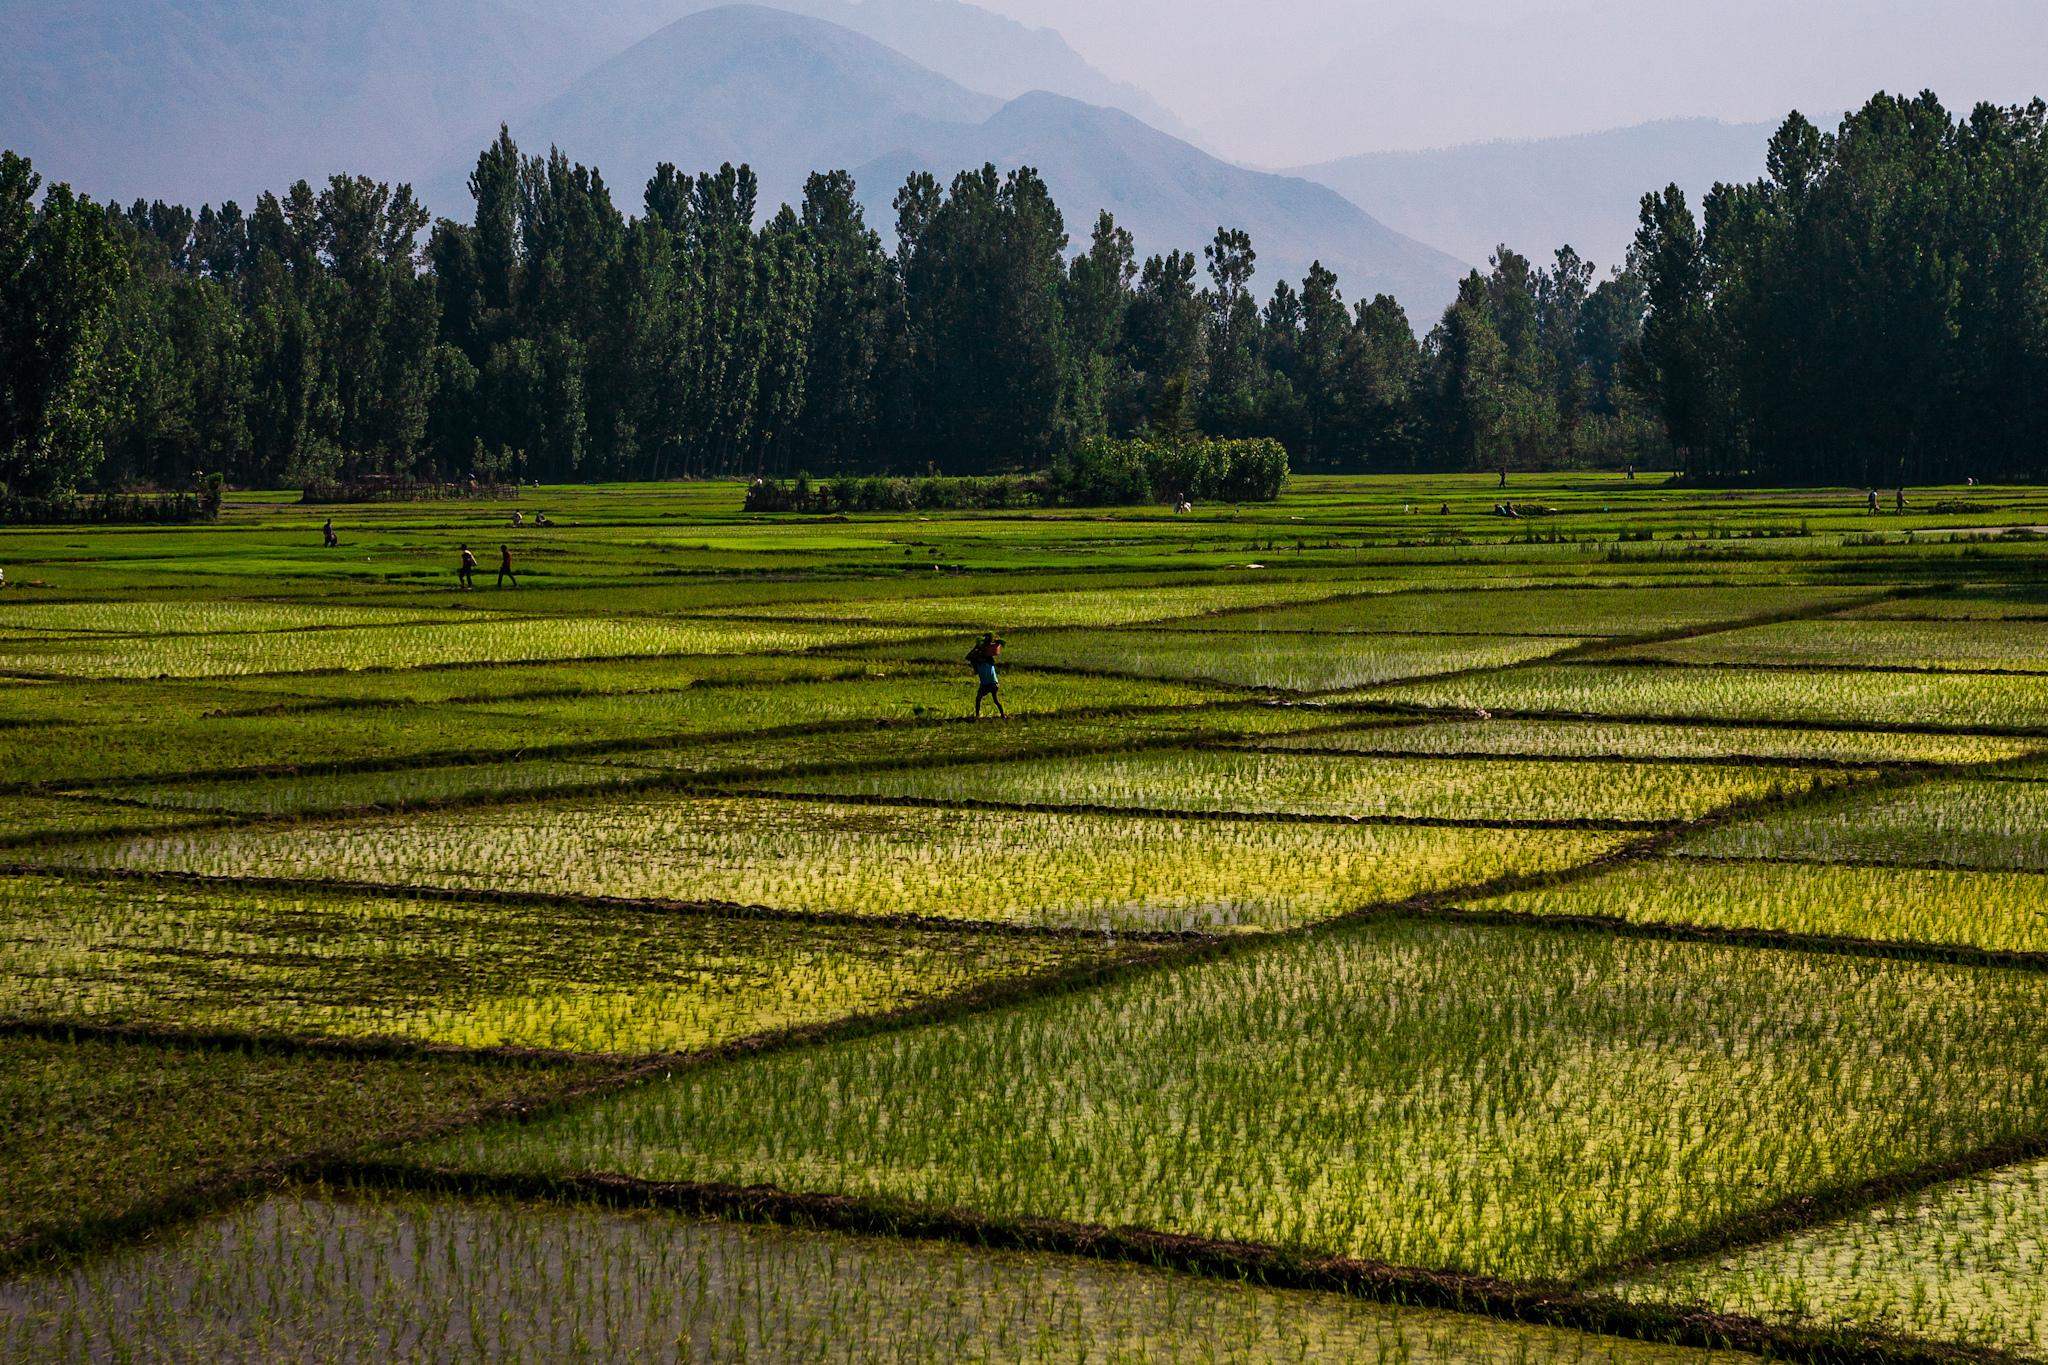 Farmers working in rice paddies